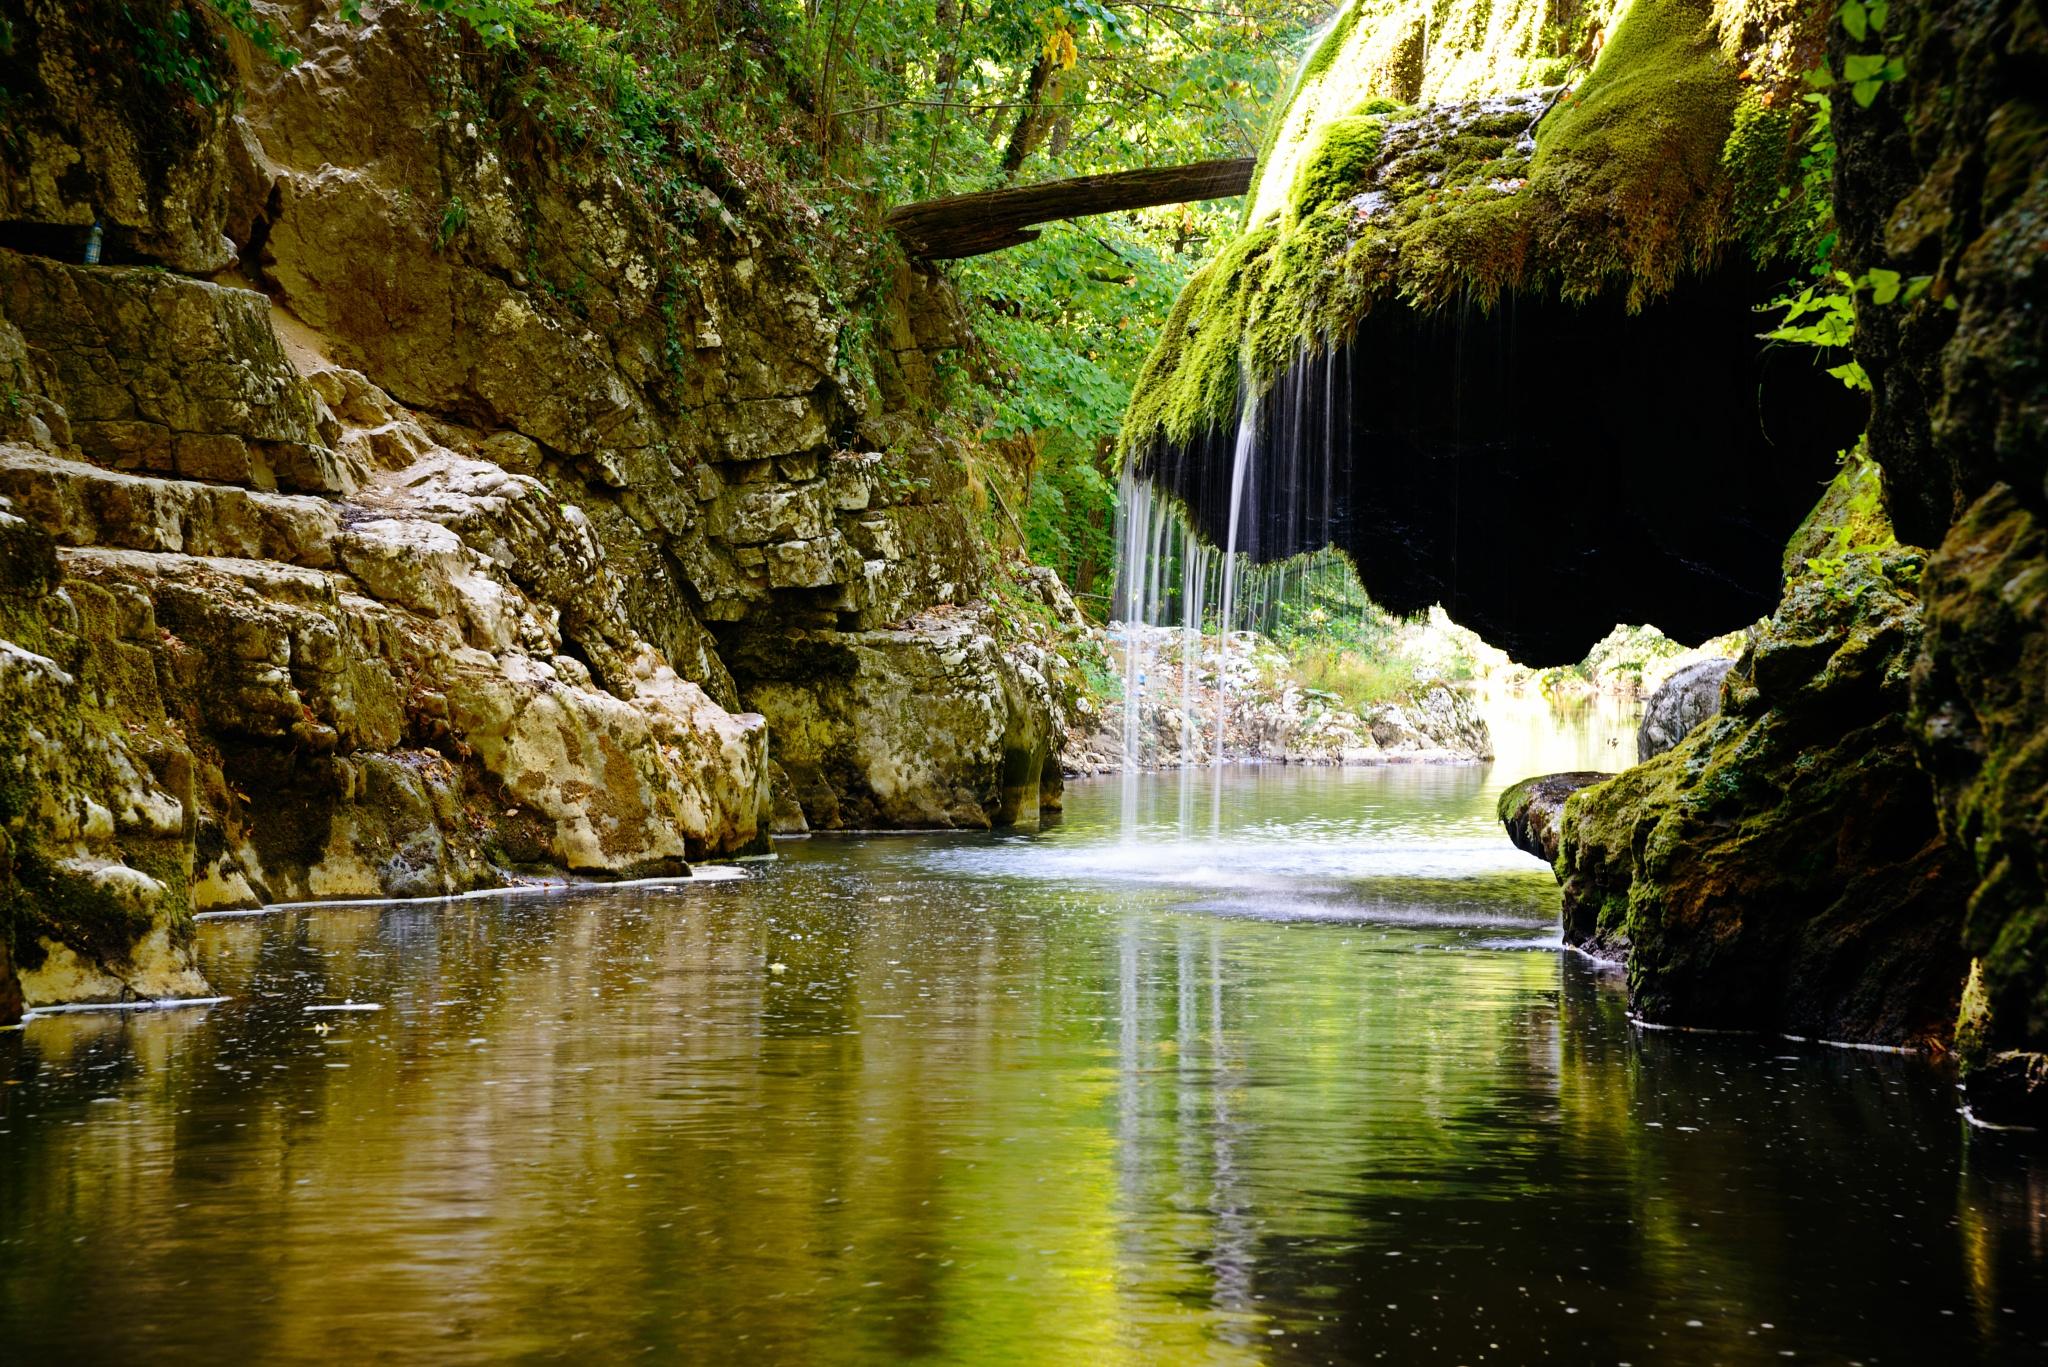 Bigar waterfall by Nicolae Ivanciu